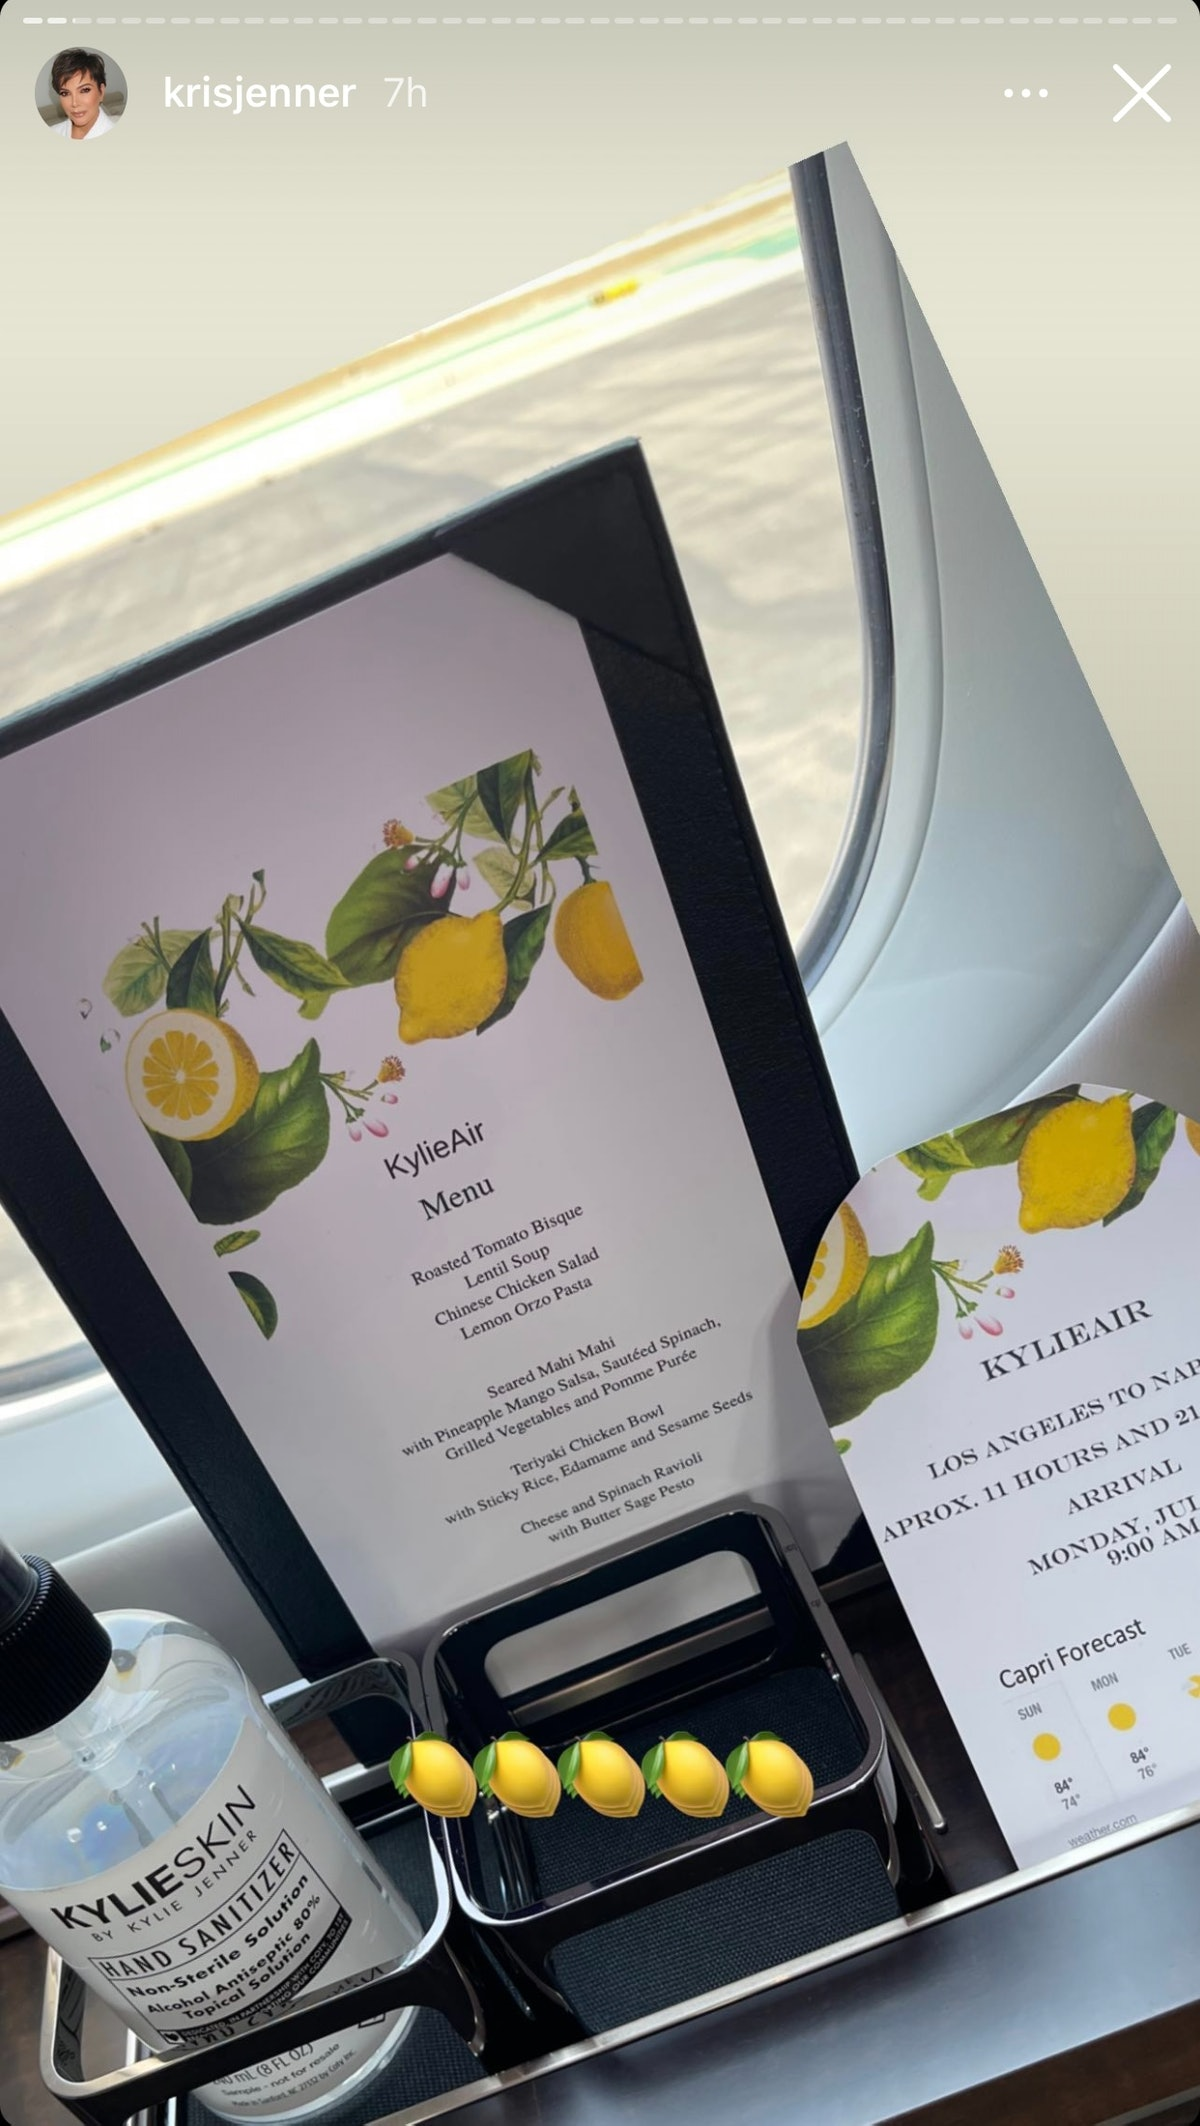 Kylie Jenner's private jet menu is impressive.